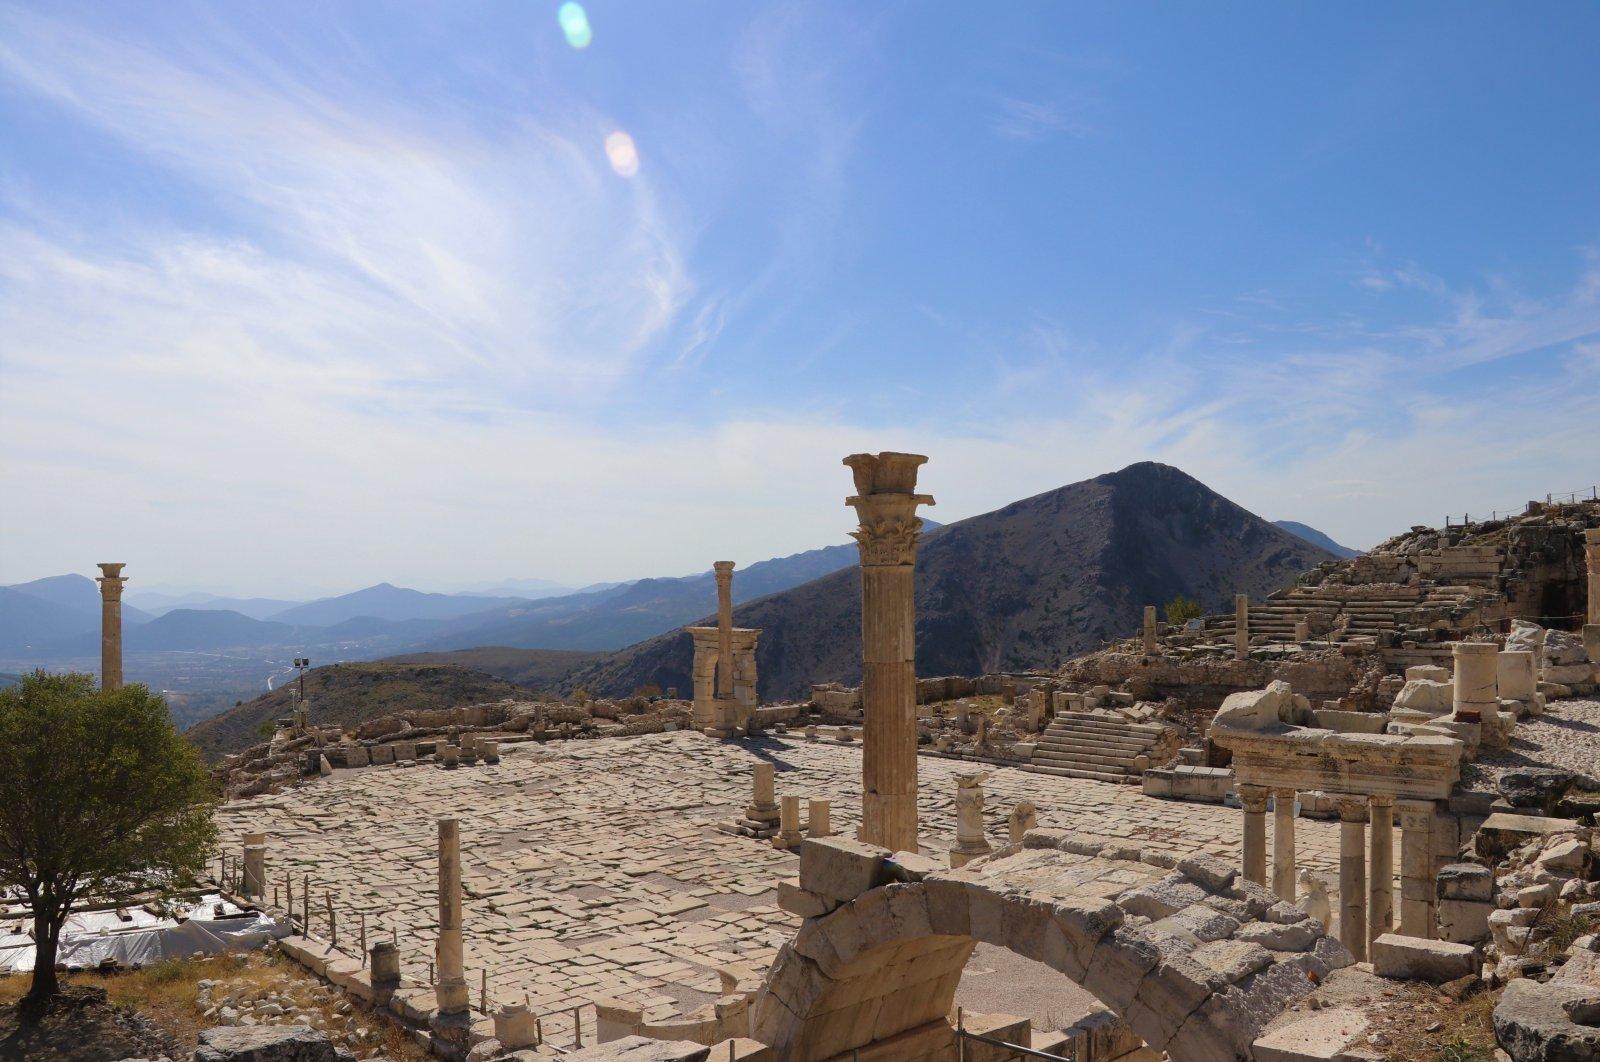 The agora of the ancient city of Sagalassos, Burdur province, southwestern Turkey, Nov. 12, 2020. (AA Photo)